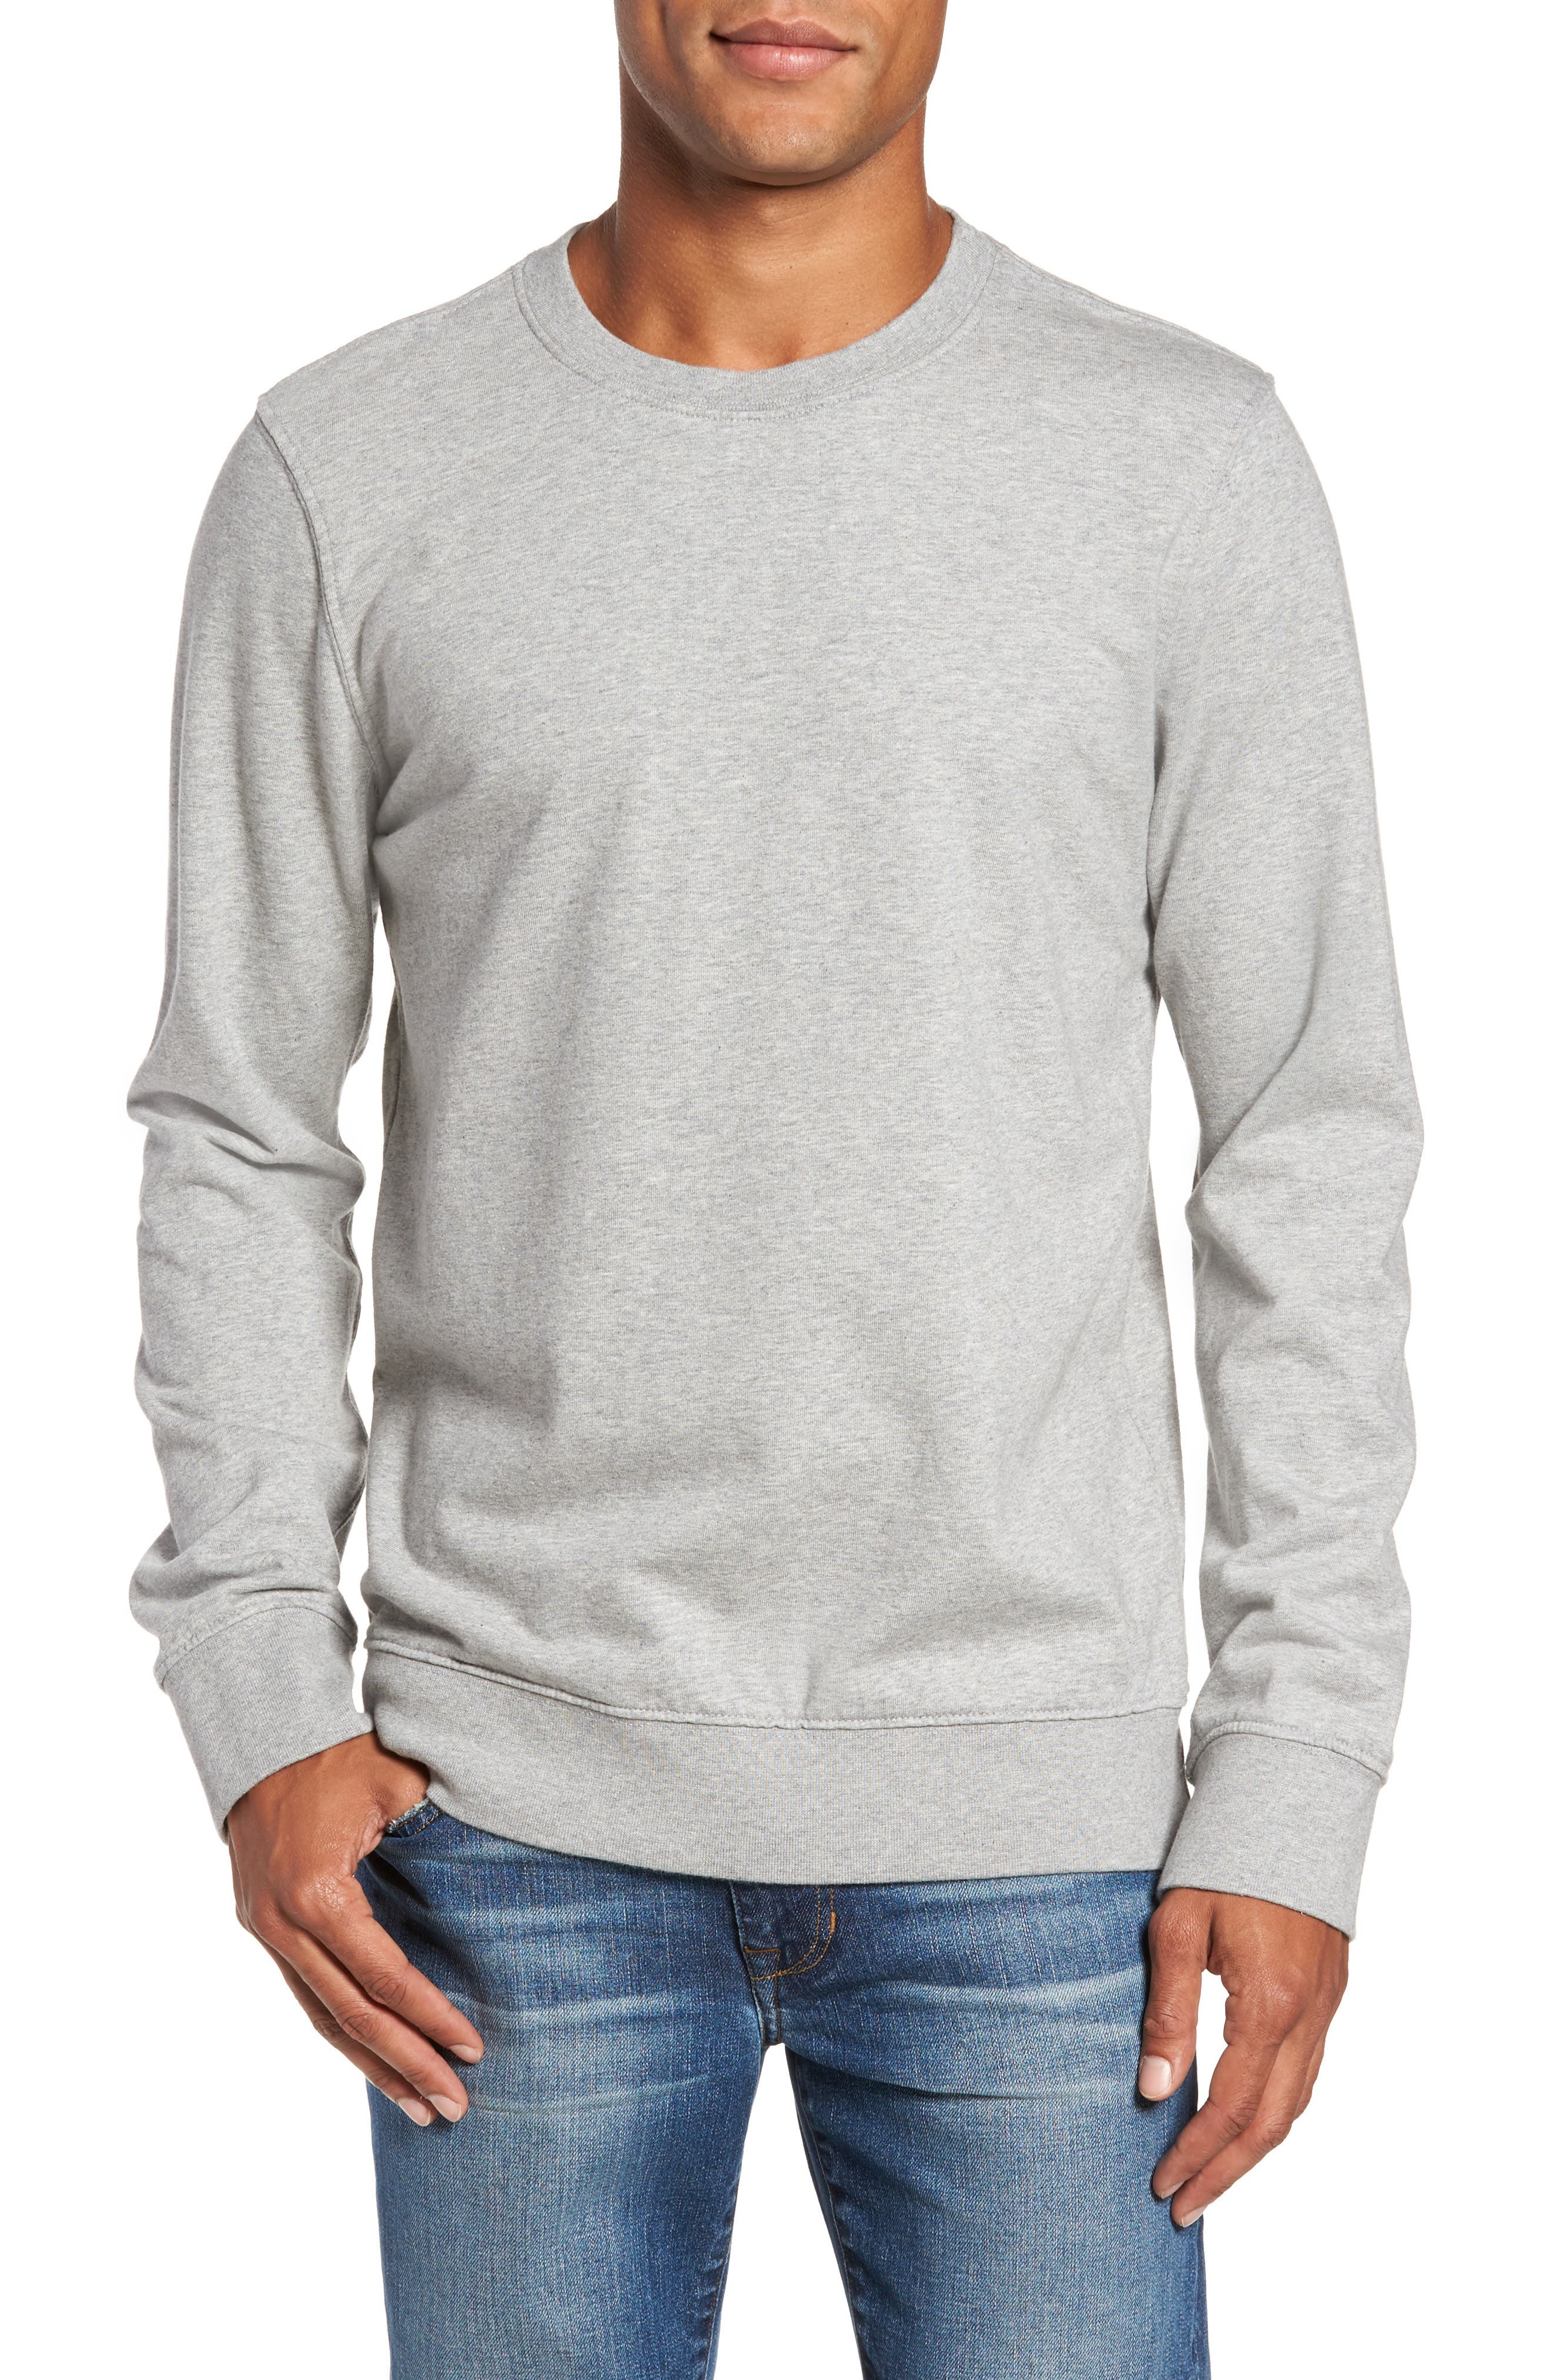 French Terry Sweatshirt,                             Main thumbnail 2, color,